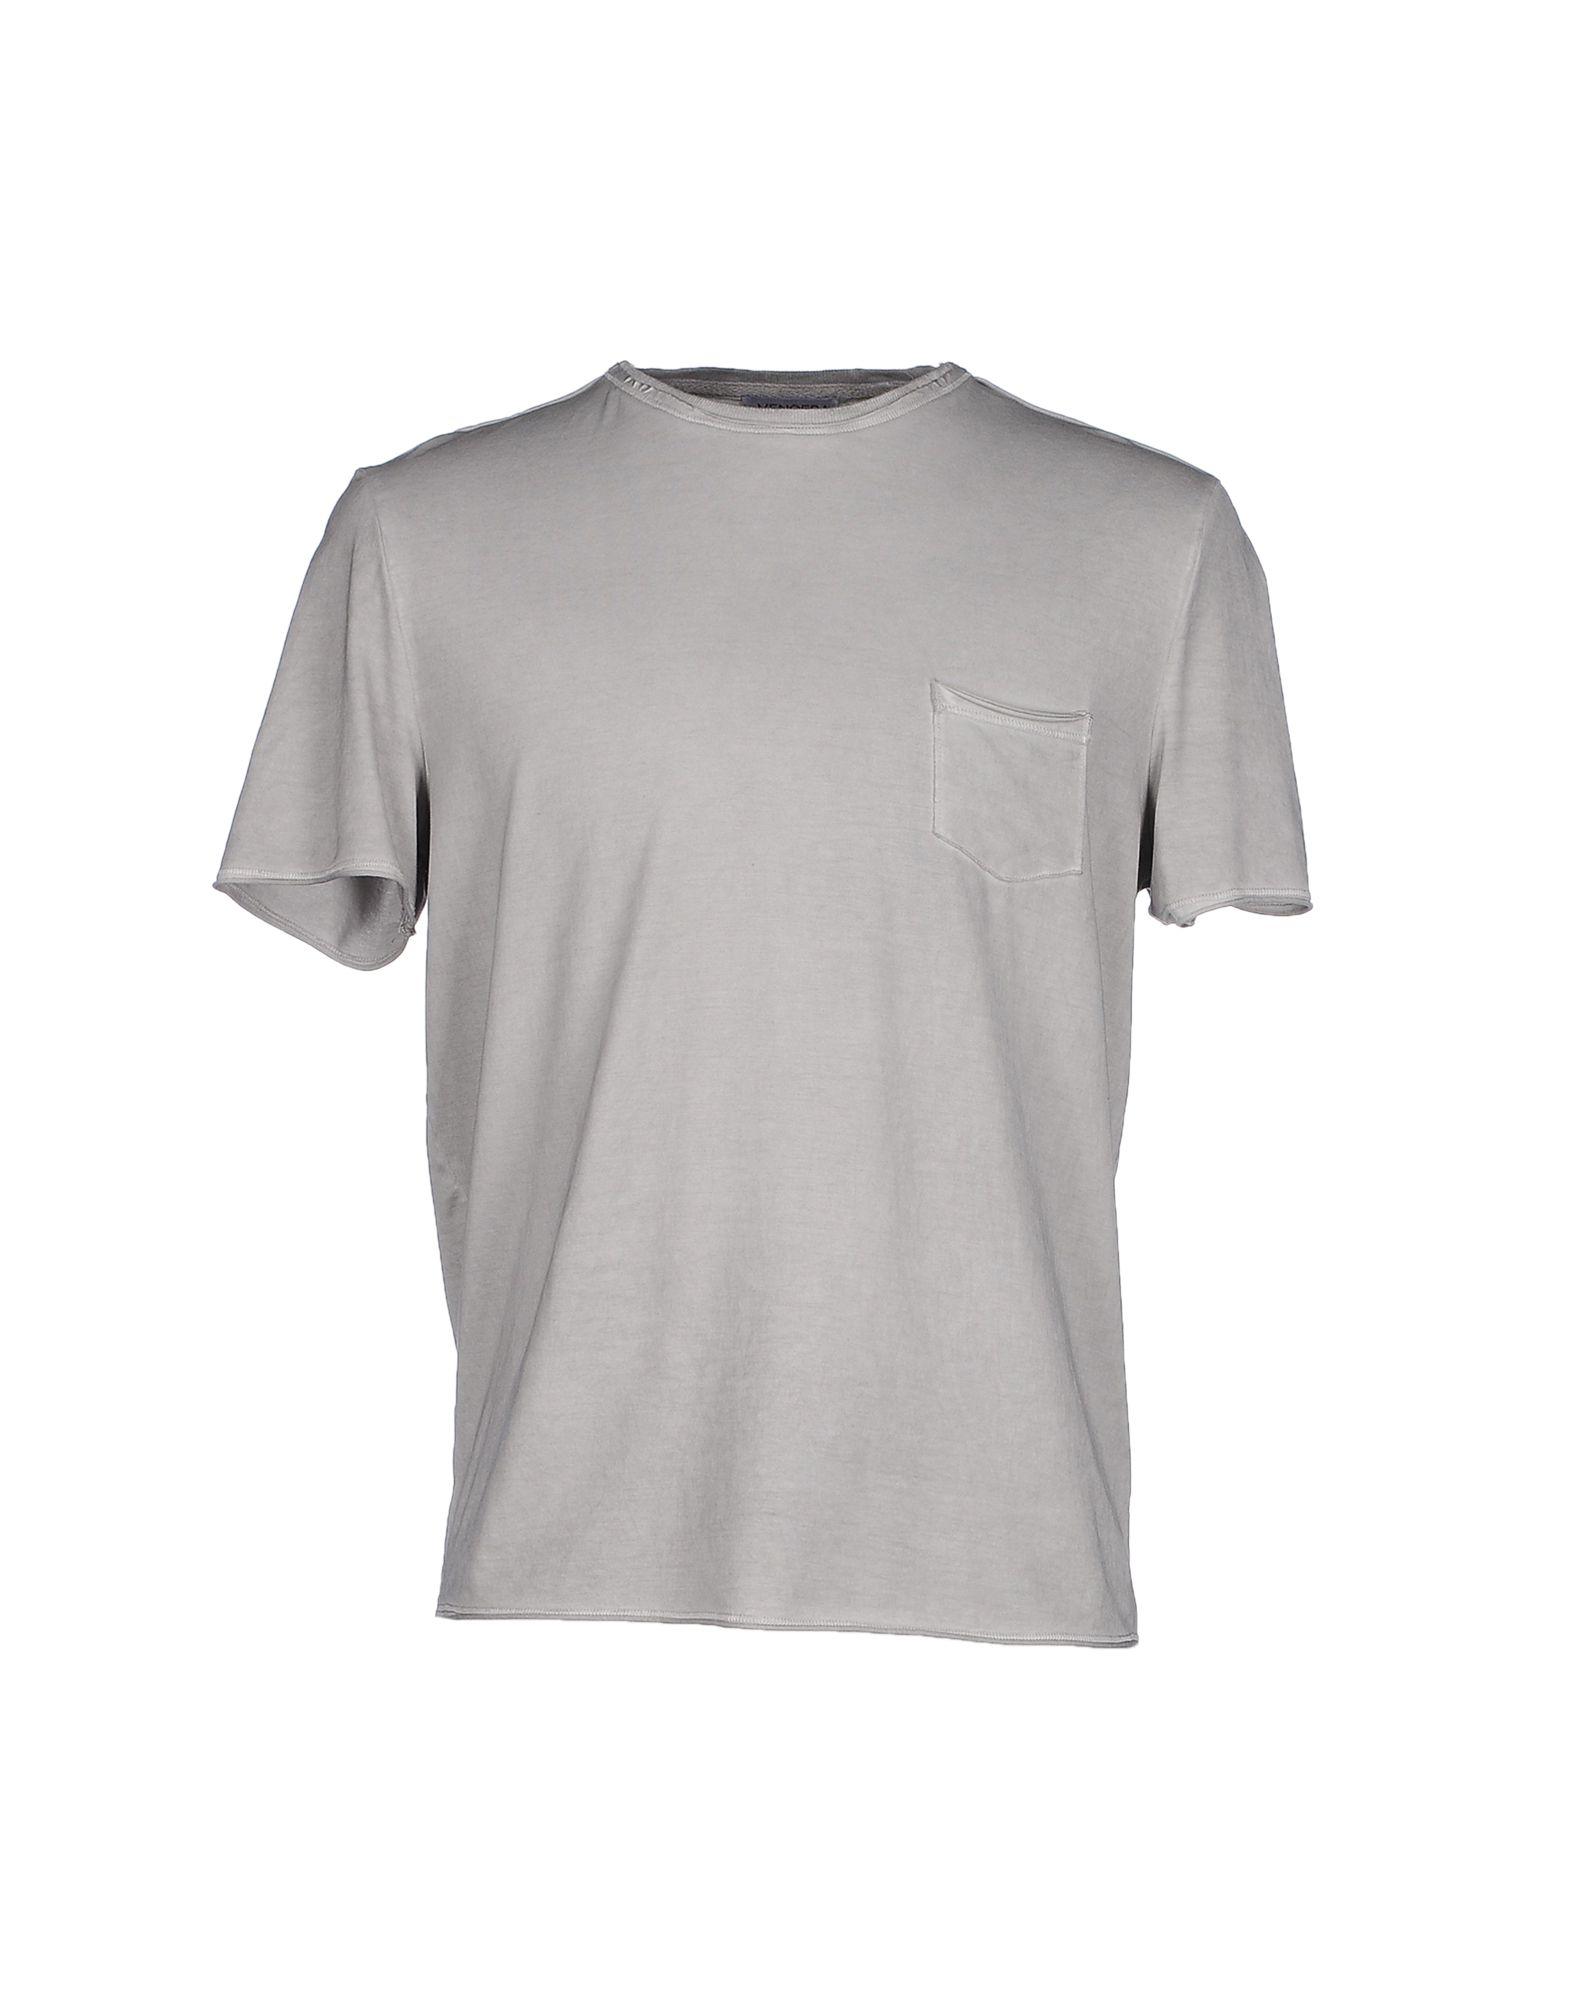 VENGERA T-Shirt in Light Grey